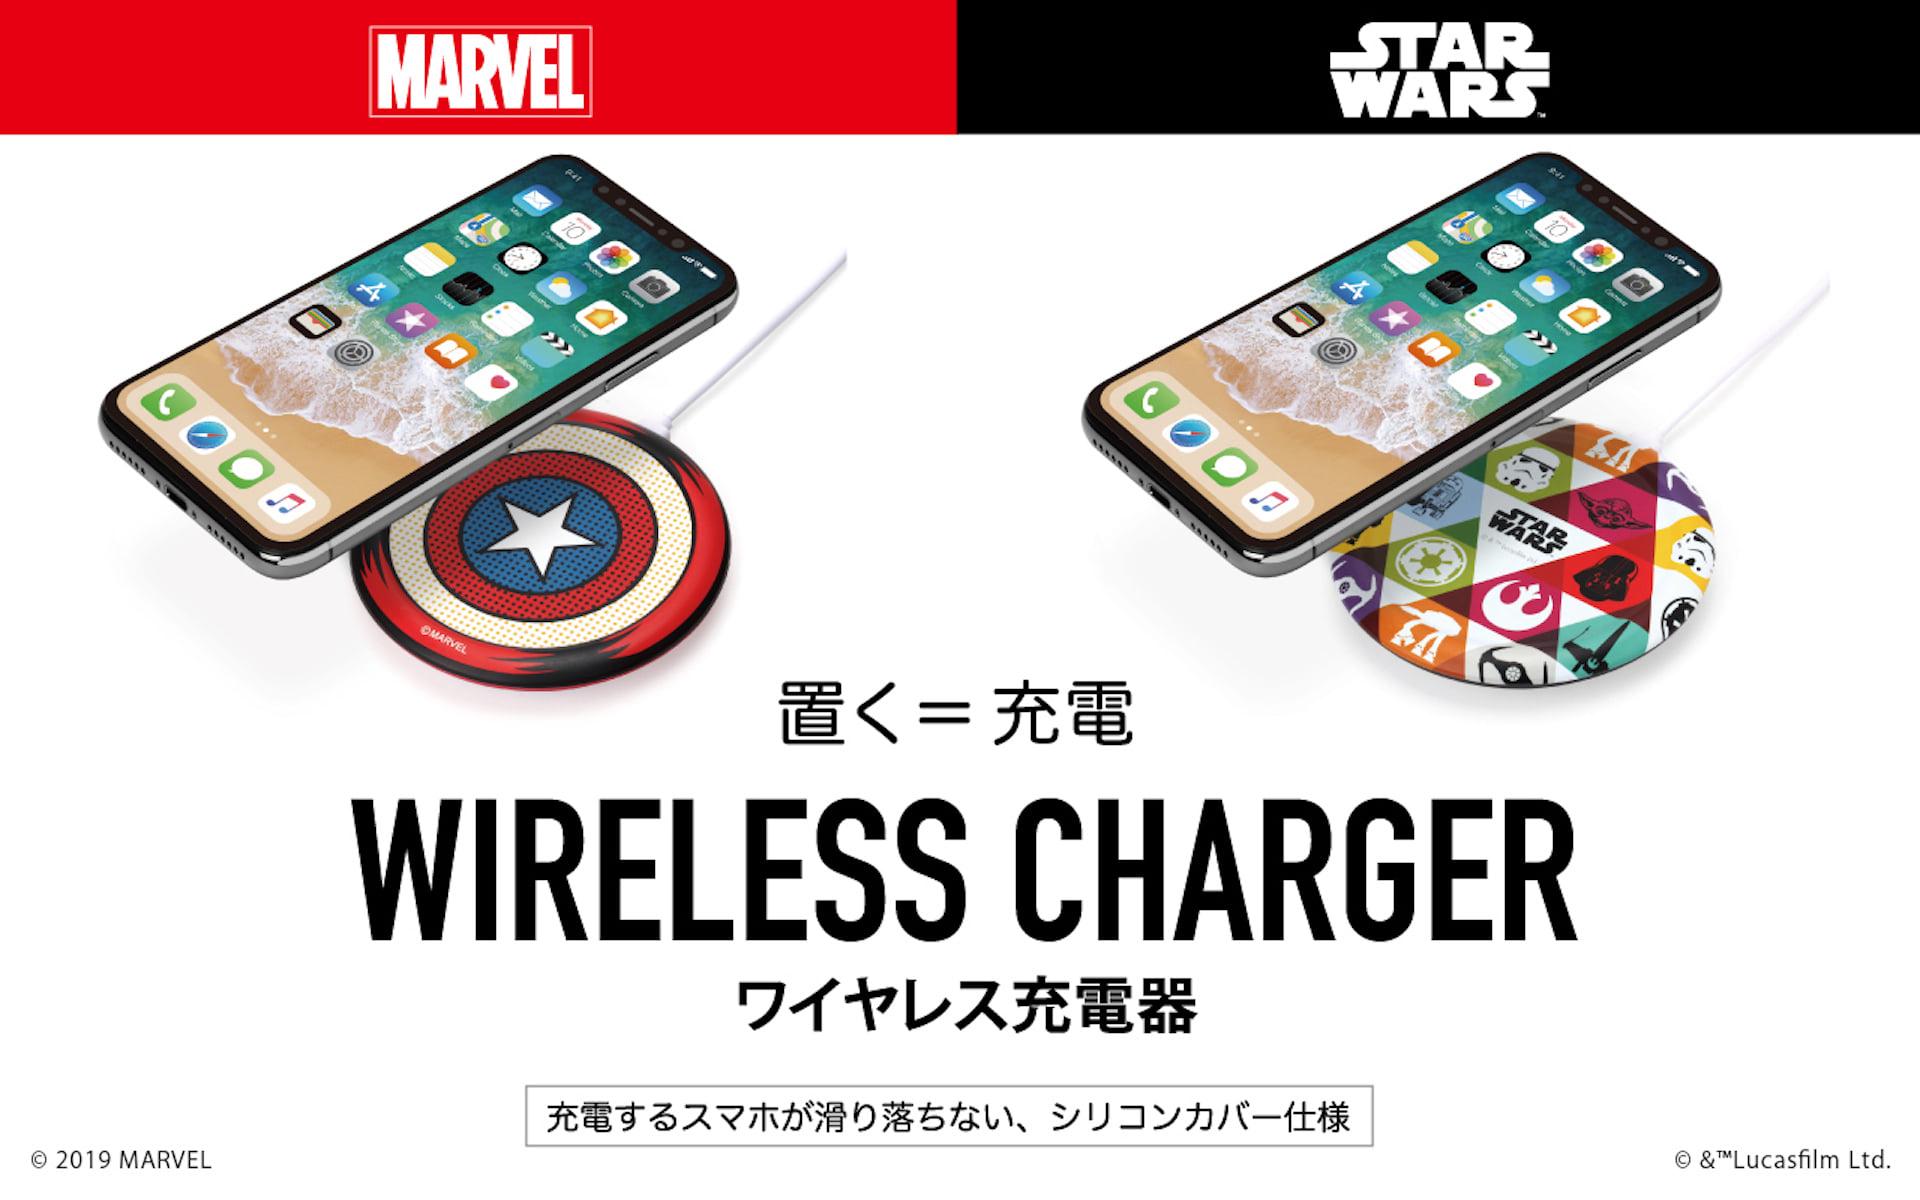 「MARVEL」「STARWARS」仕様のQi認証ワイヤレス充電器が登場|厚さ12mm、置くだけで充電可能 technology190718marvel-qichager_1-1920x1200